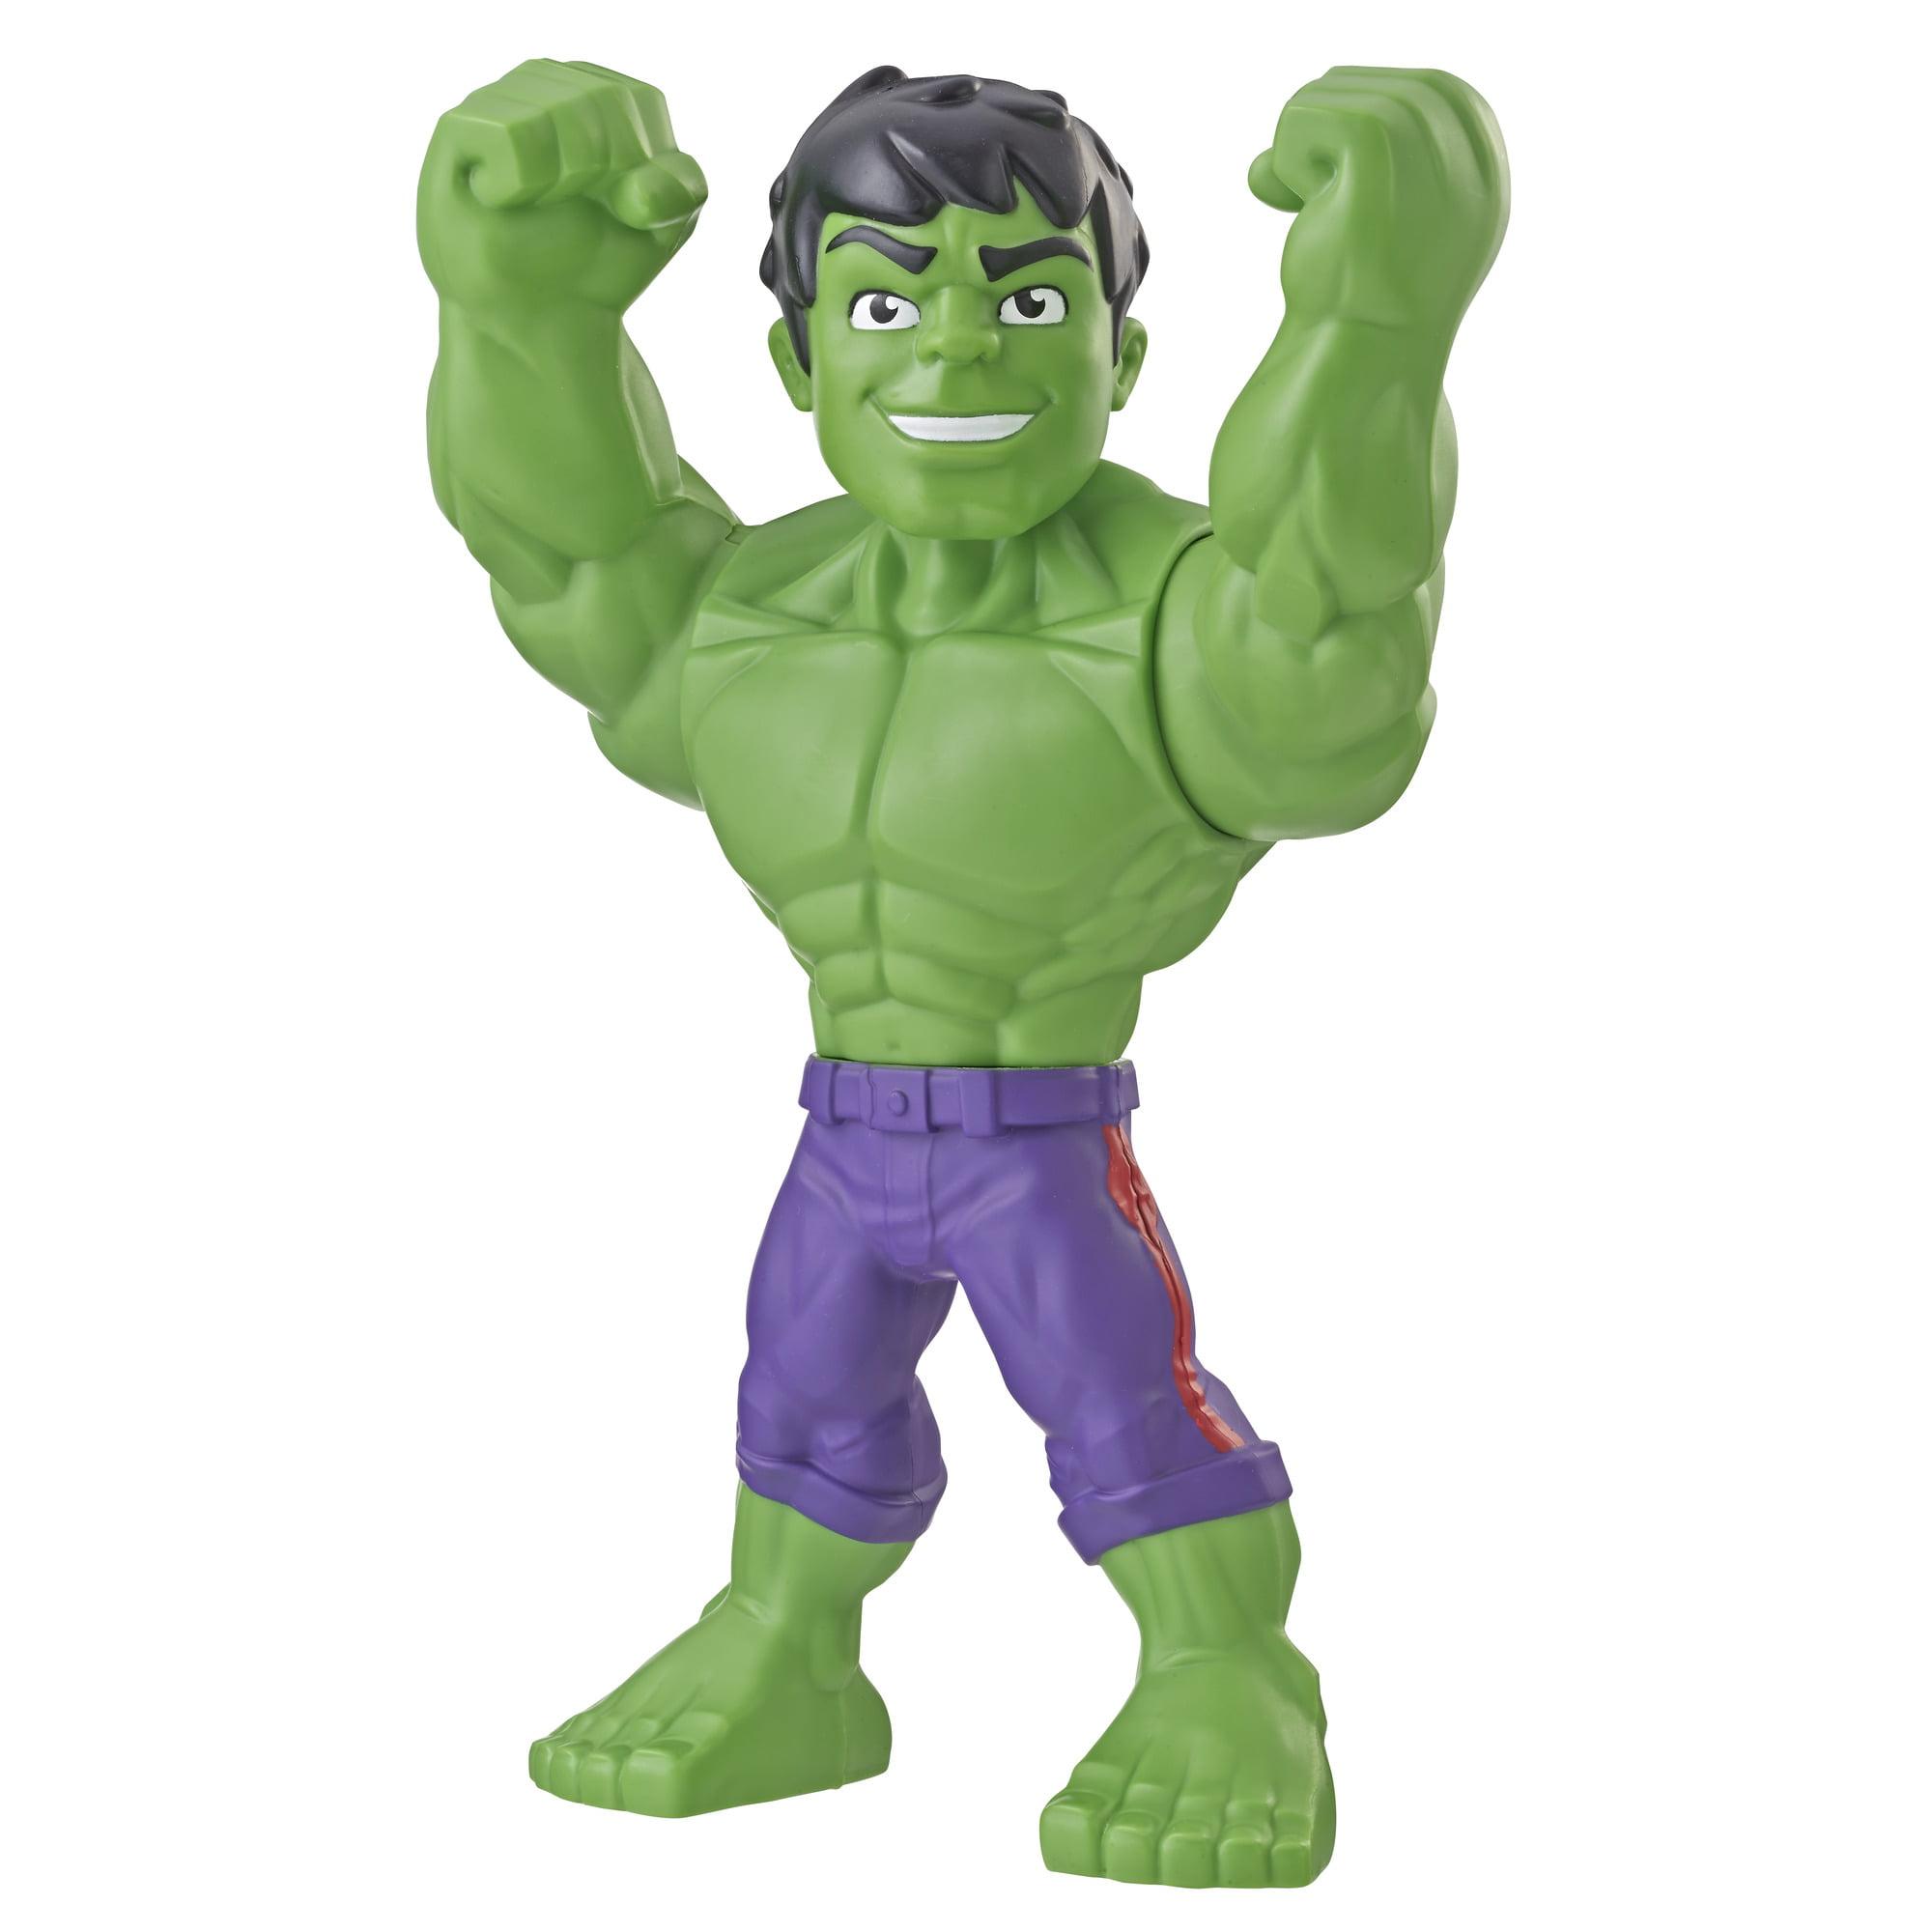 2ab384f7c40f5 Playskool Heroes Marvel Super Hero Adventures Mega Mighties Hulk, 10-Inch  Action Figure, Toys for Kids Ages 3 and Up - Walmart.com